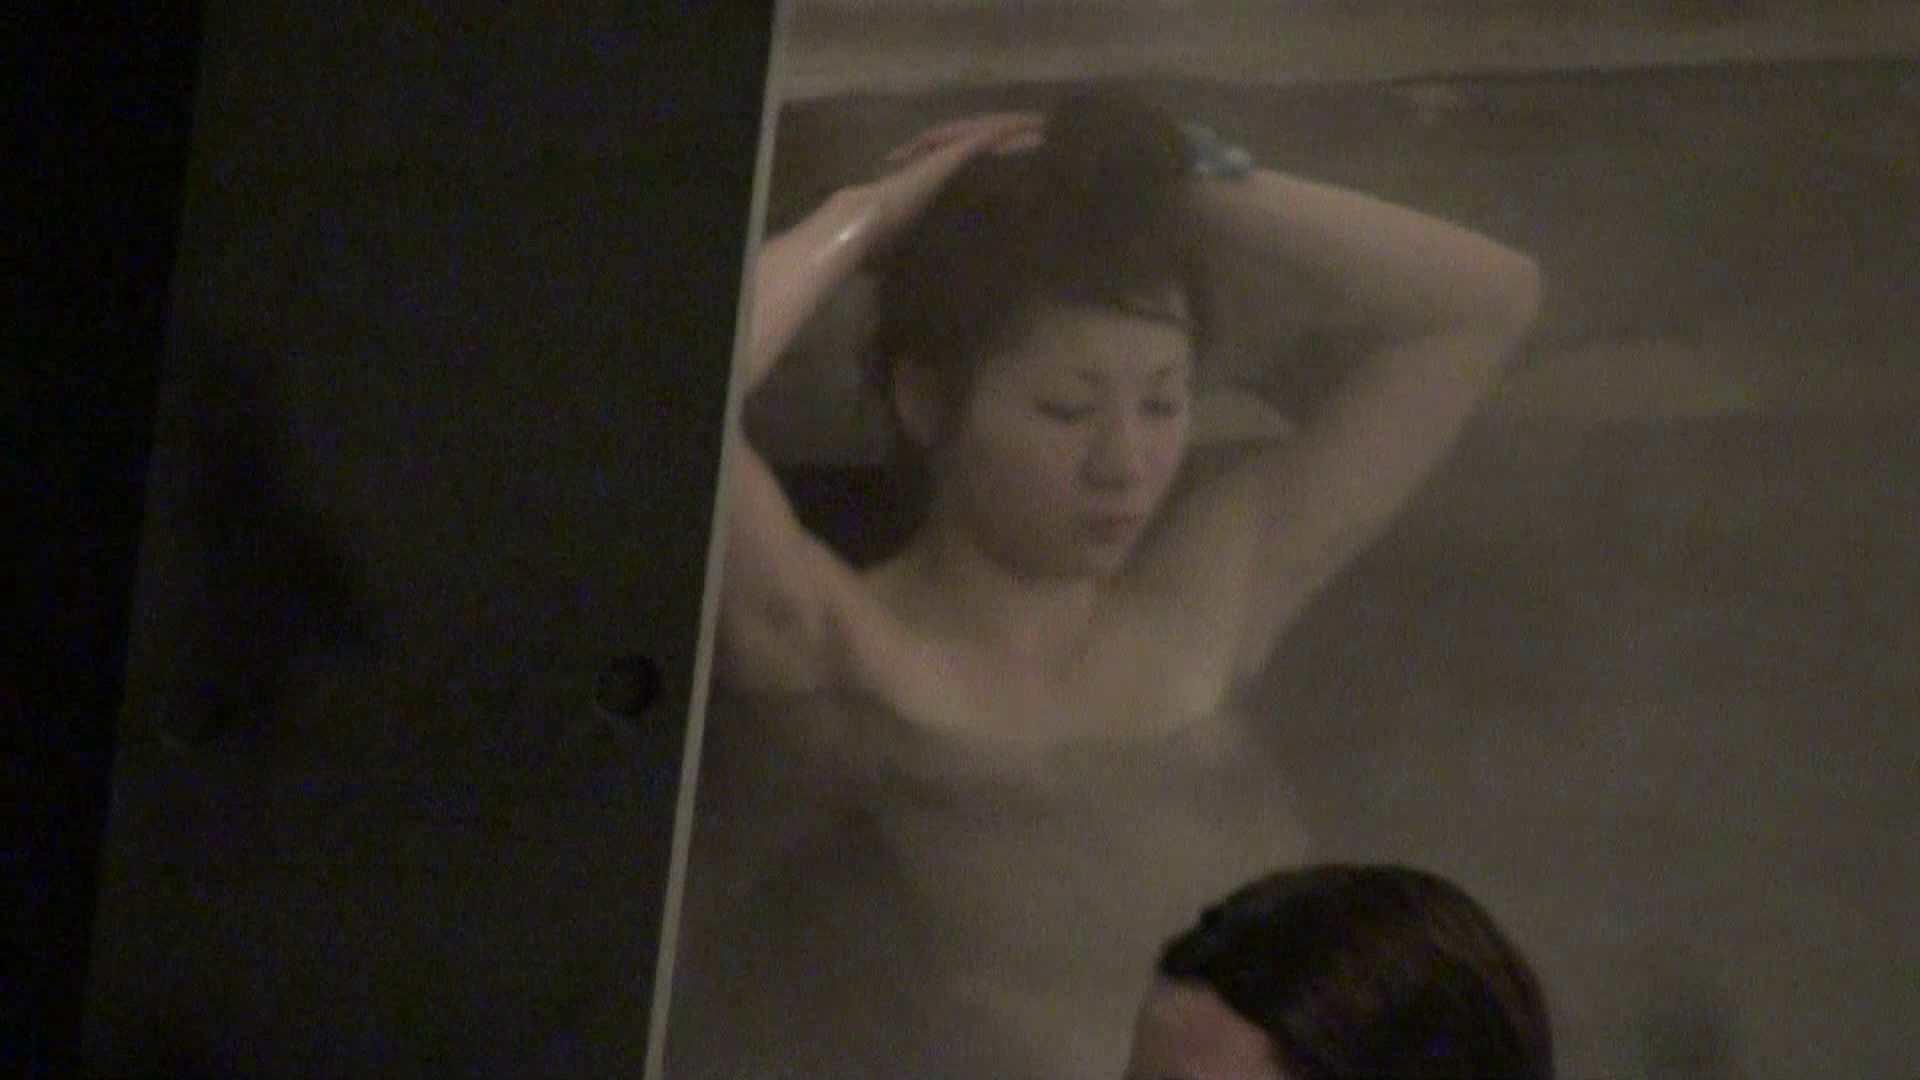 Aquaな露天風呂Vol.440 OLセックス 盗撮おまんこ無修正動画無料 63画像 41